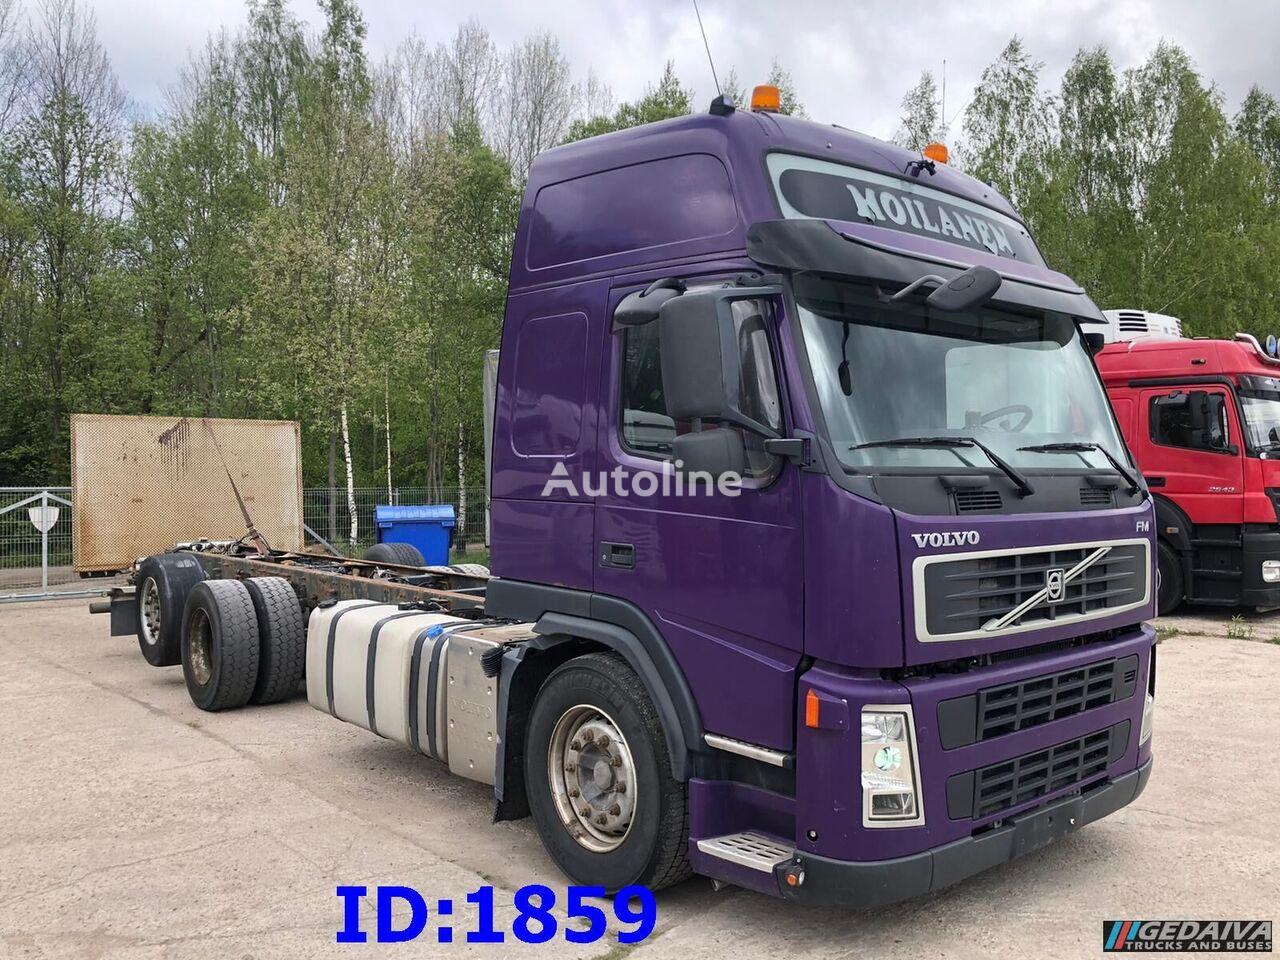 nákladní vozidlo podvozek VOLVO FH 450 6x2 Euro5